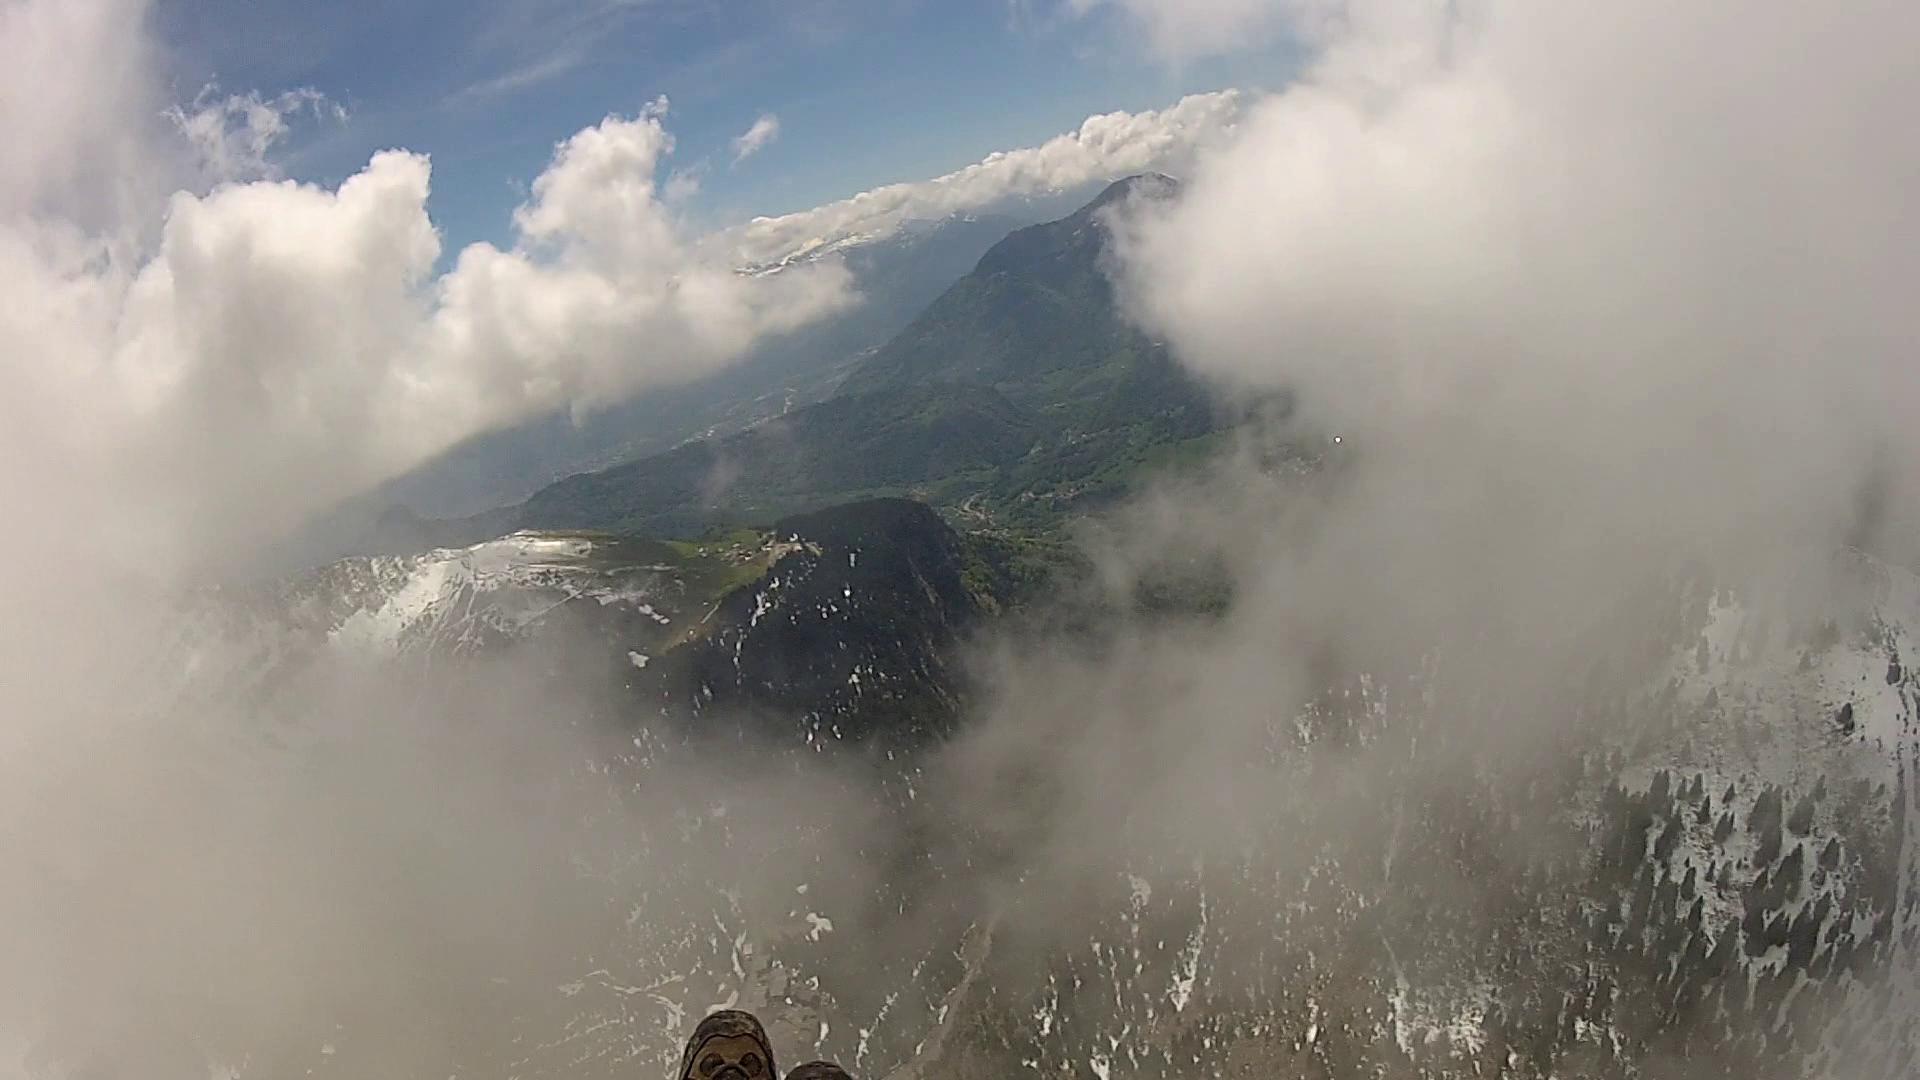 image traversée de nuage